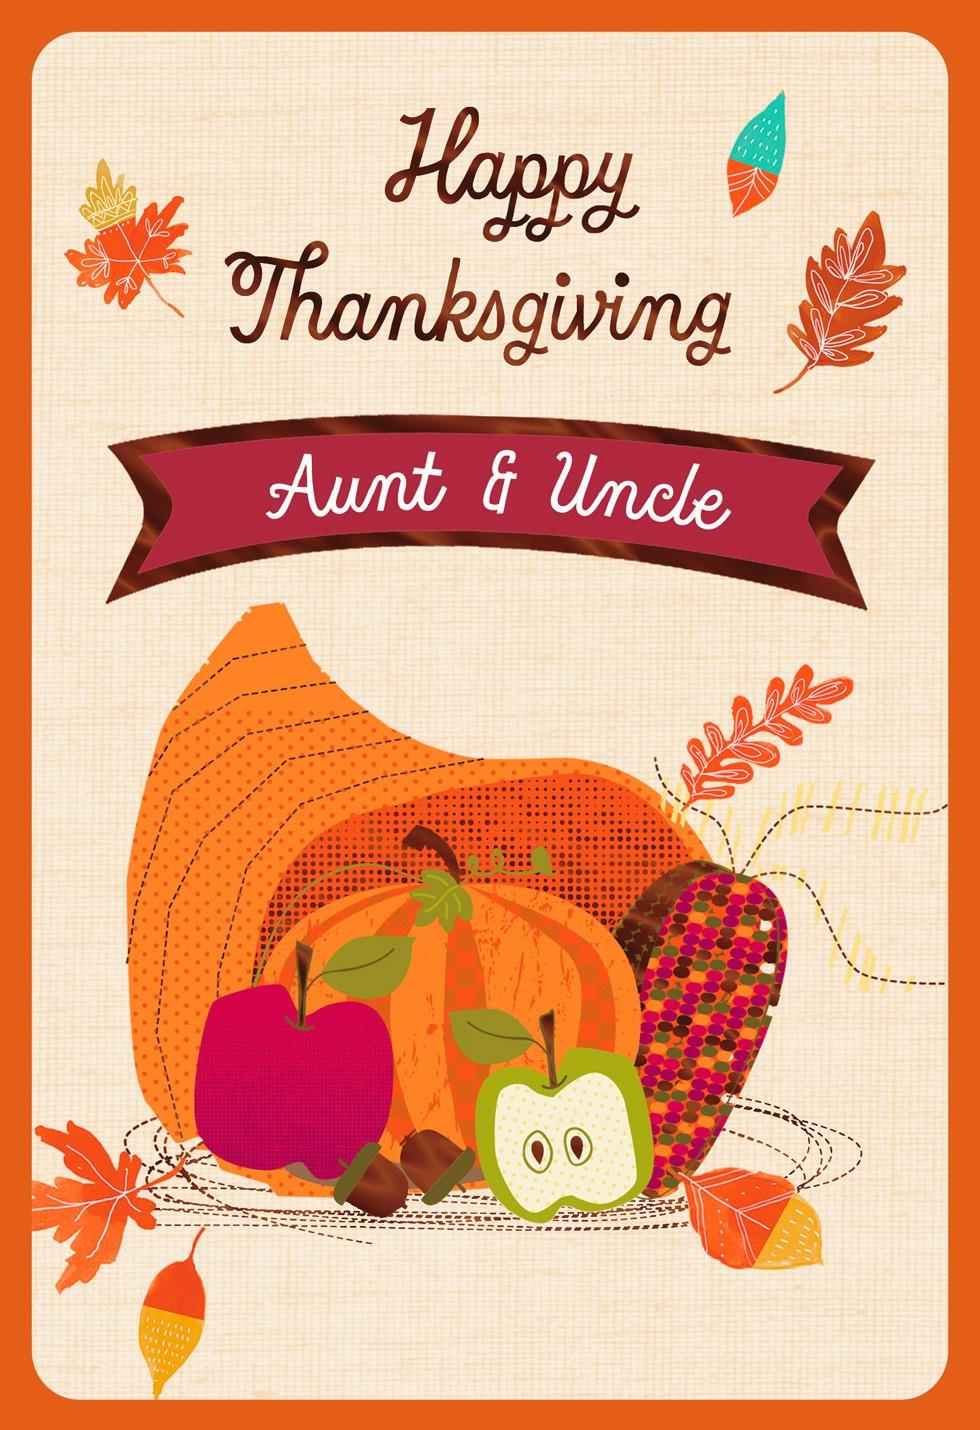 Cornucopia Thanksgiving Card With Customizable Family